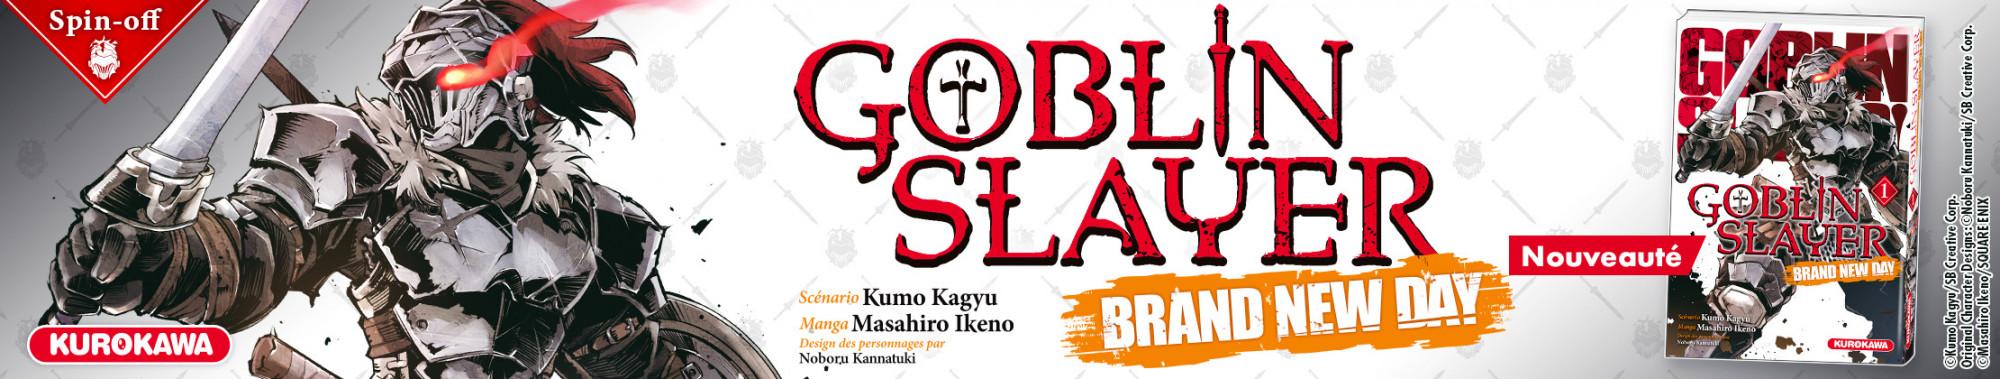 Bannière - KUROKAWA - Goblin Slayer - Brand New Day - T1